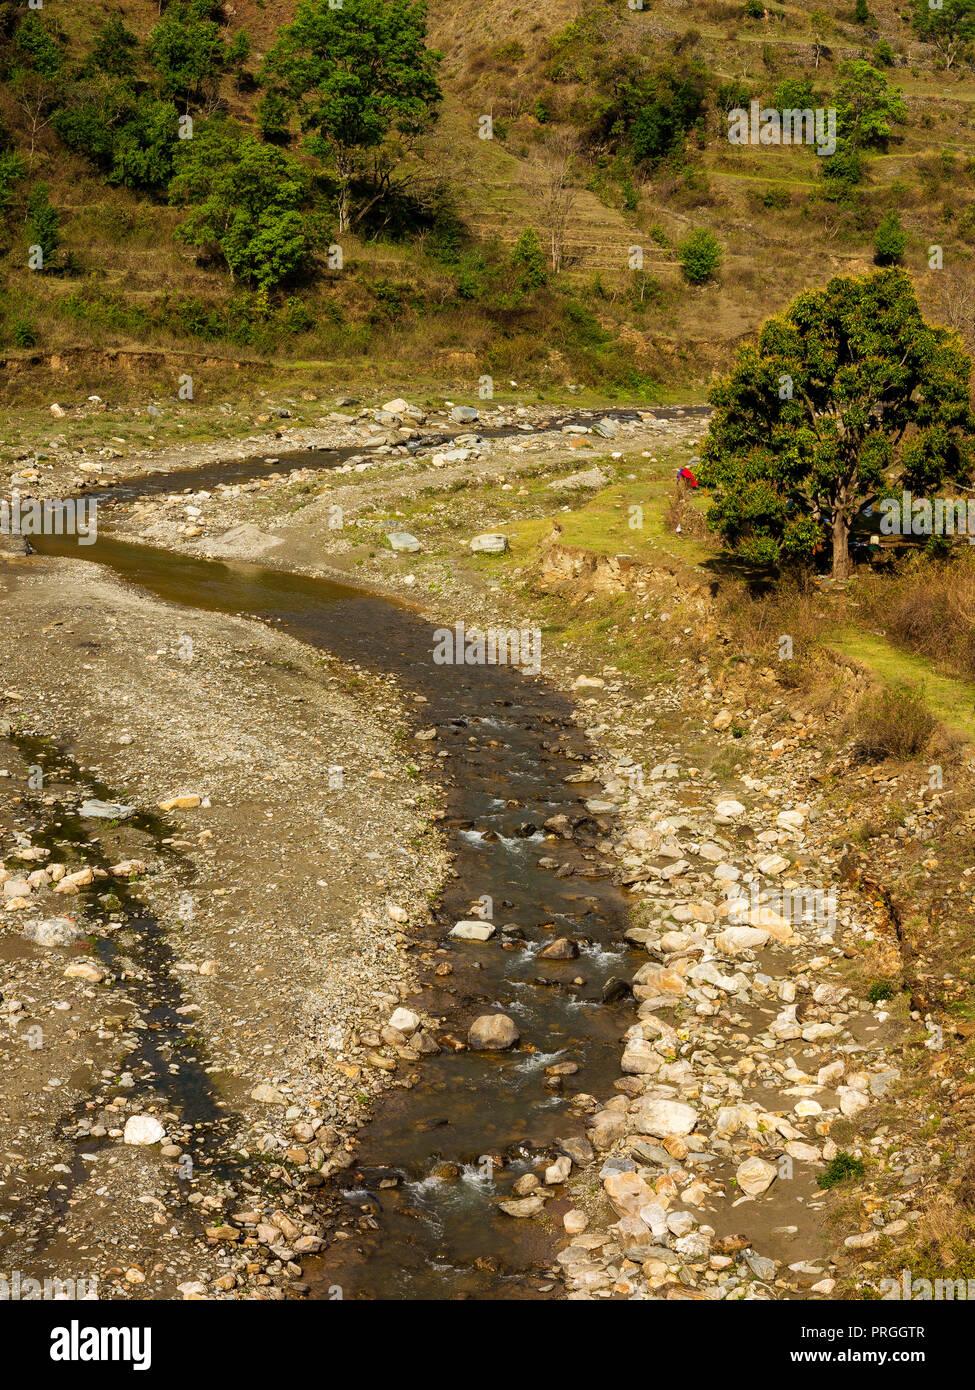 El Río Panar remoto, las colinas de Kumaon, Uttarakhand, India Imagen De Stock